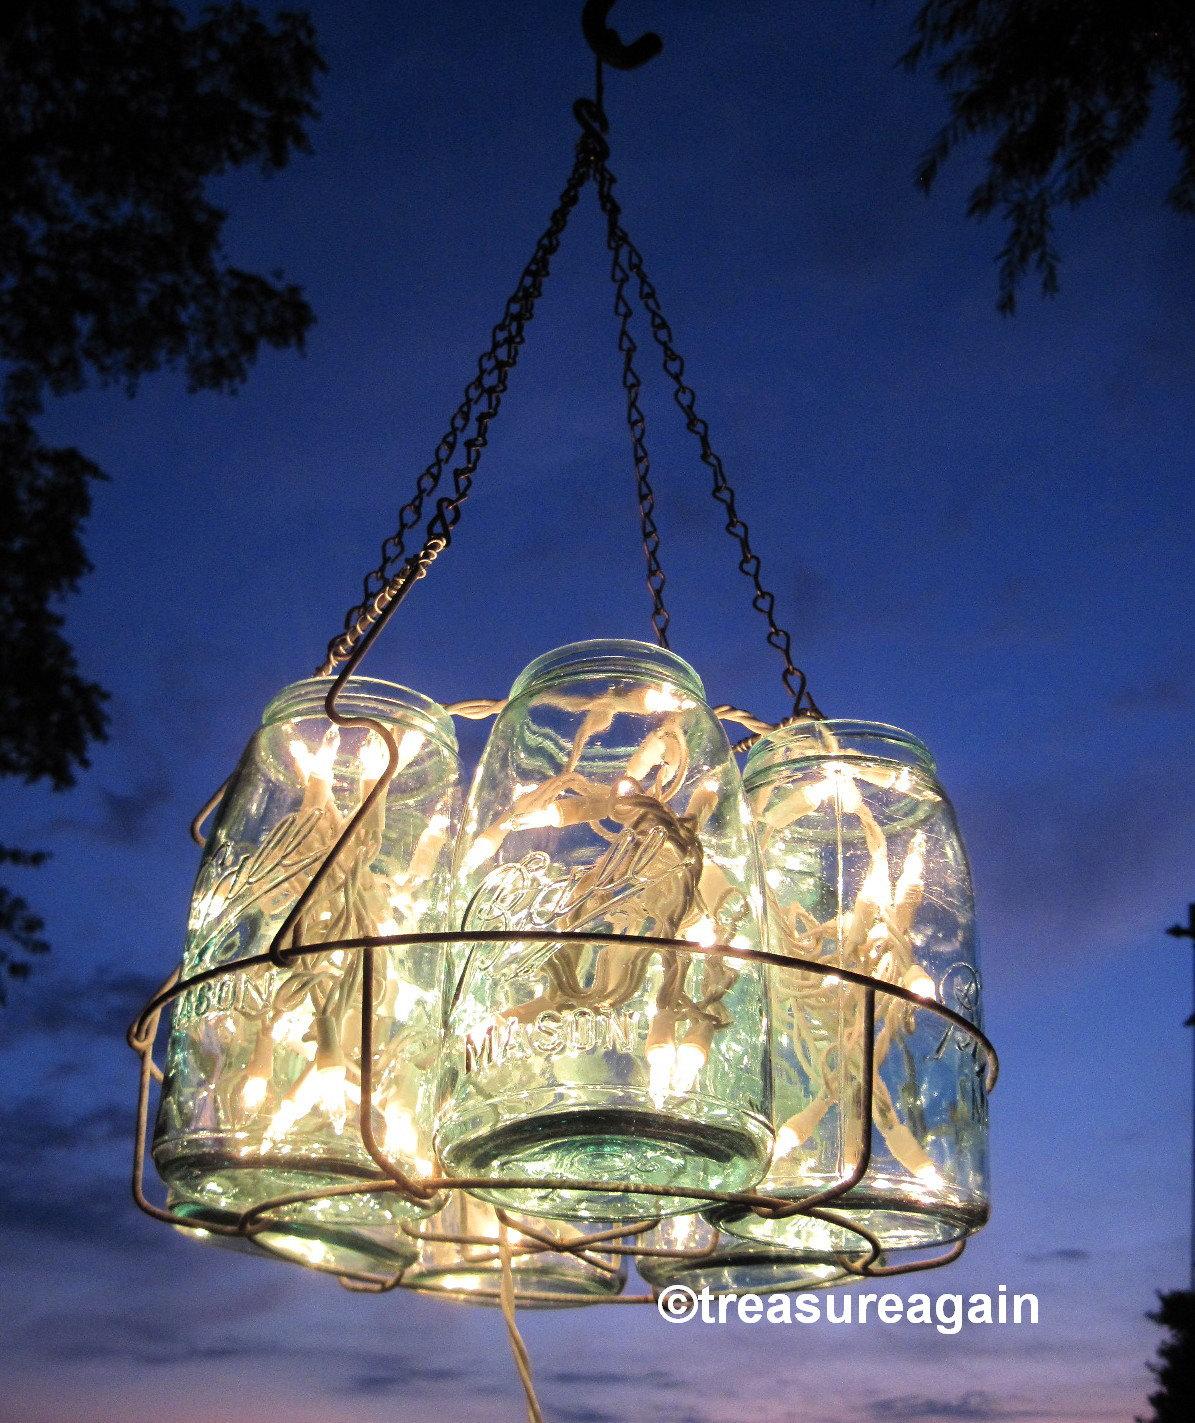 Mason Jar Chandelier: Vintage Chandelier Antique Mason Jar Chandelier 6 Sloped Blue